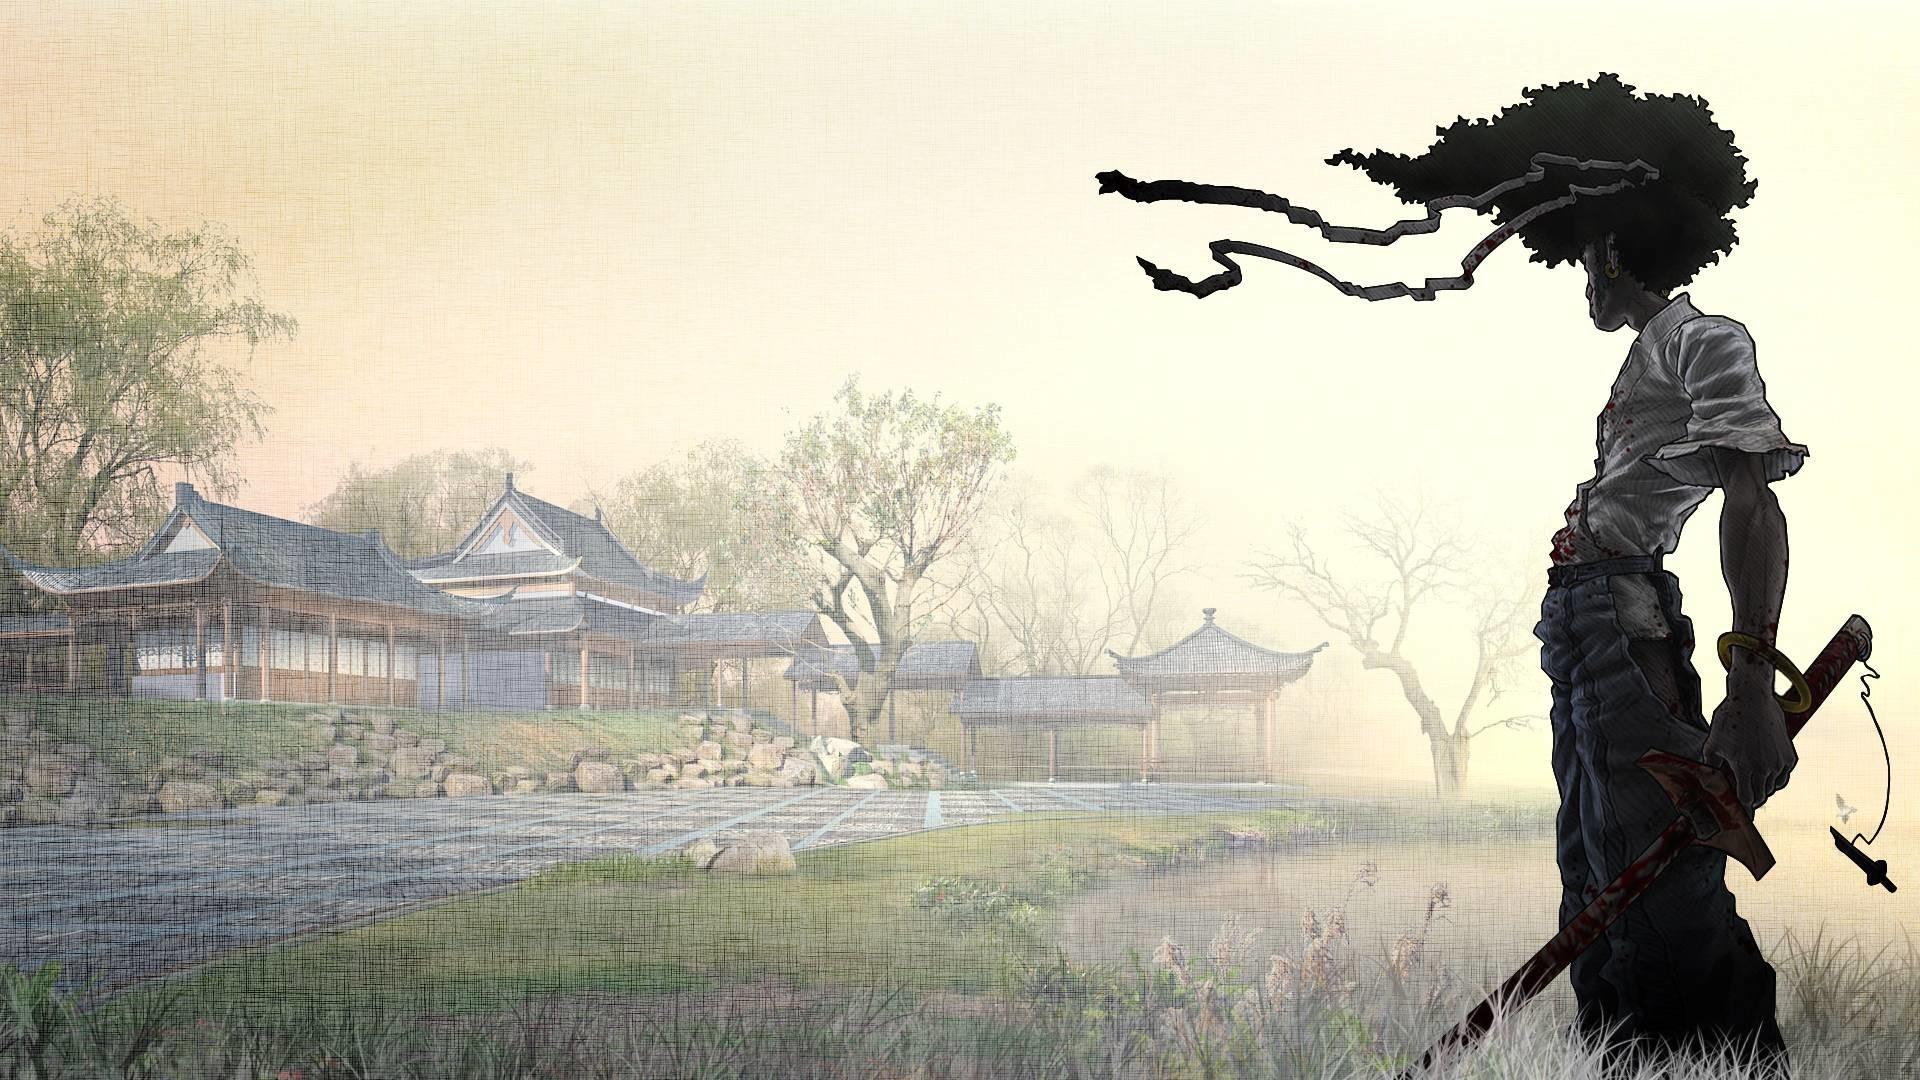 Afro Samurai Wallpaper Free Download – cartoon Hd wallpapers